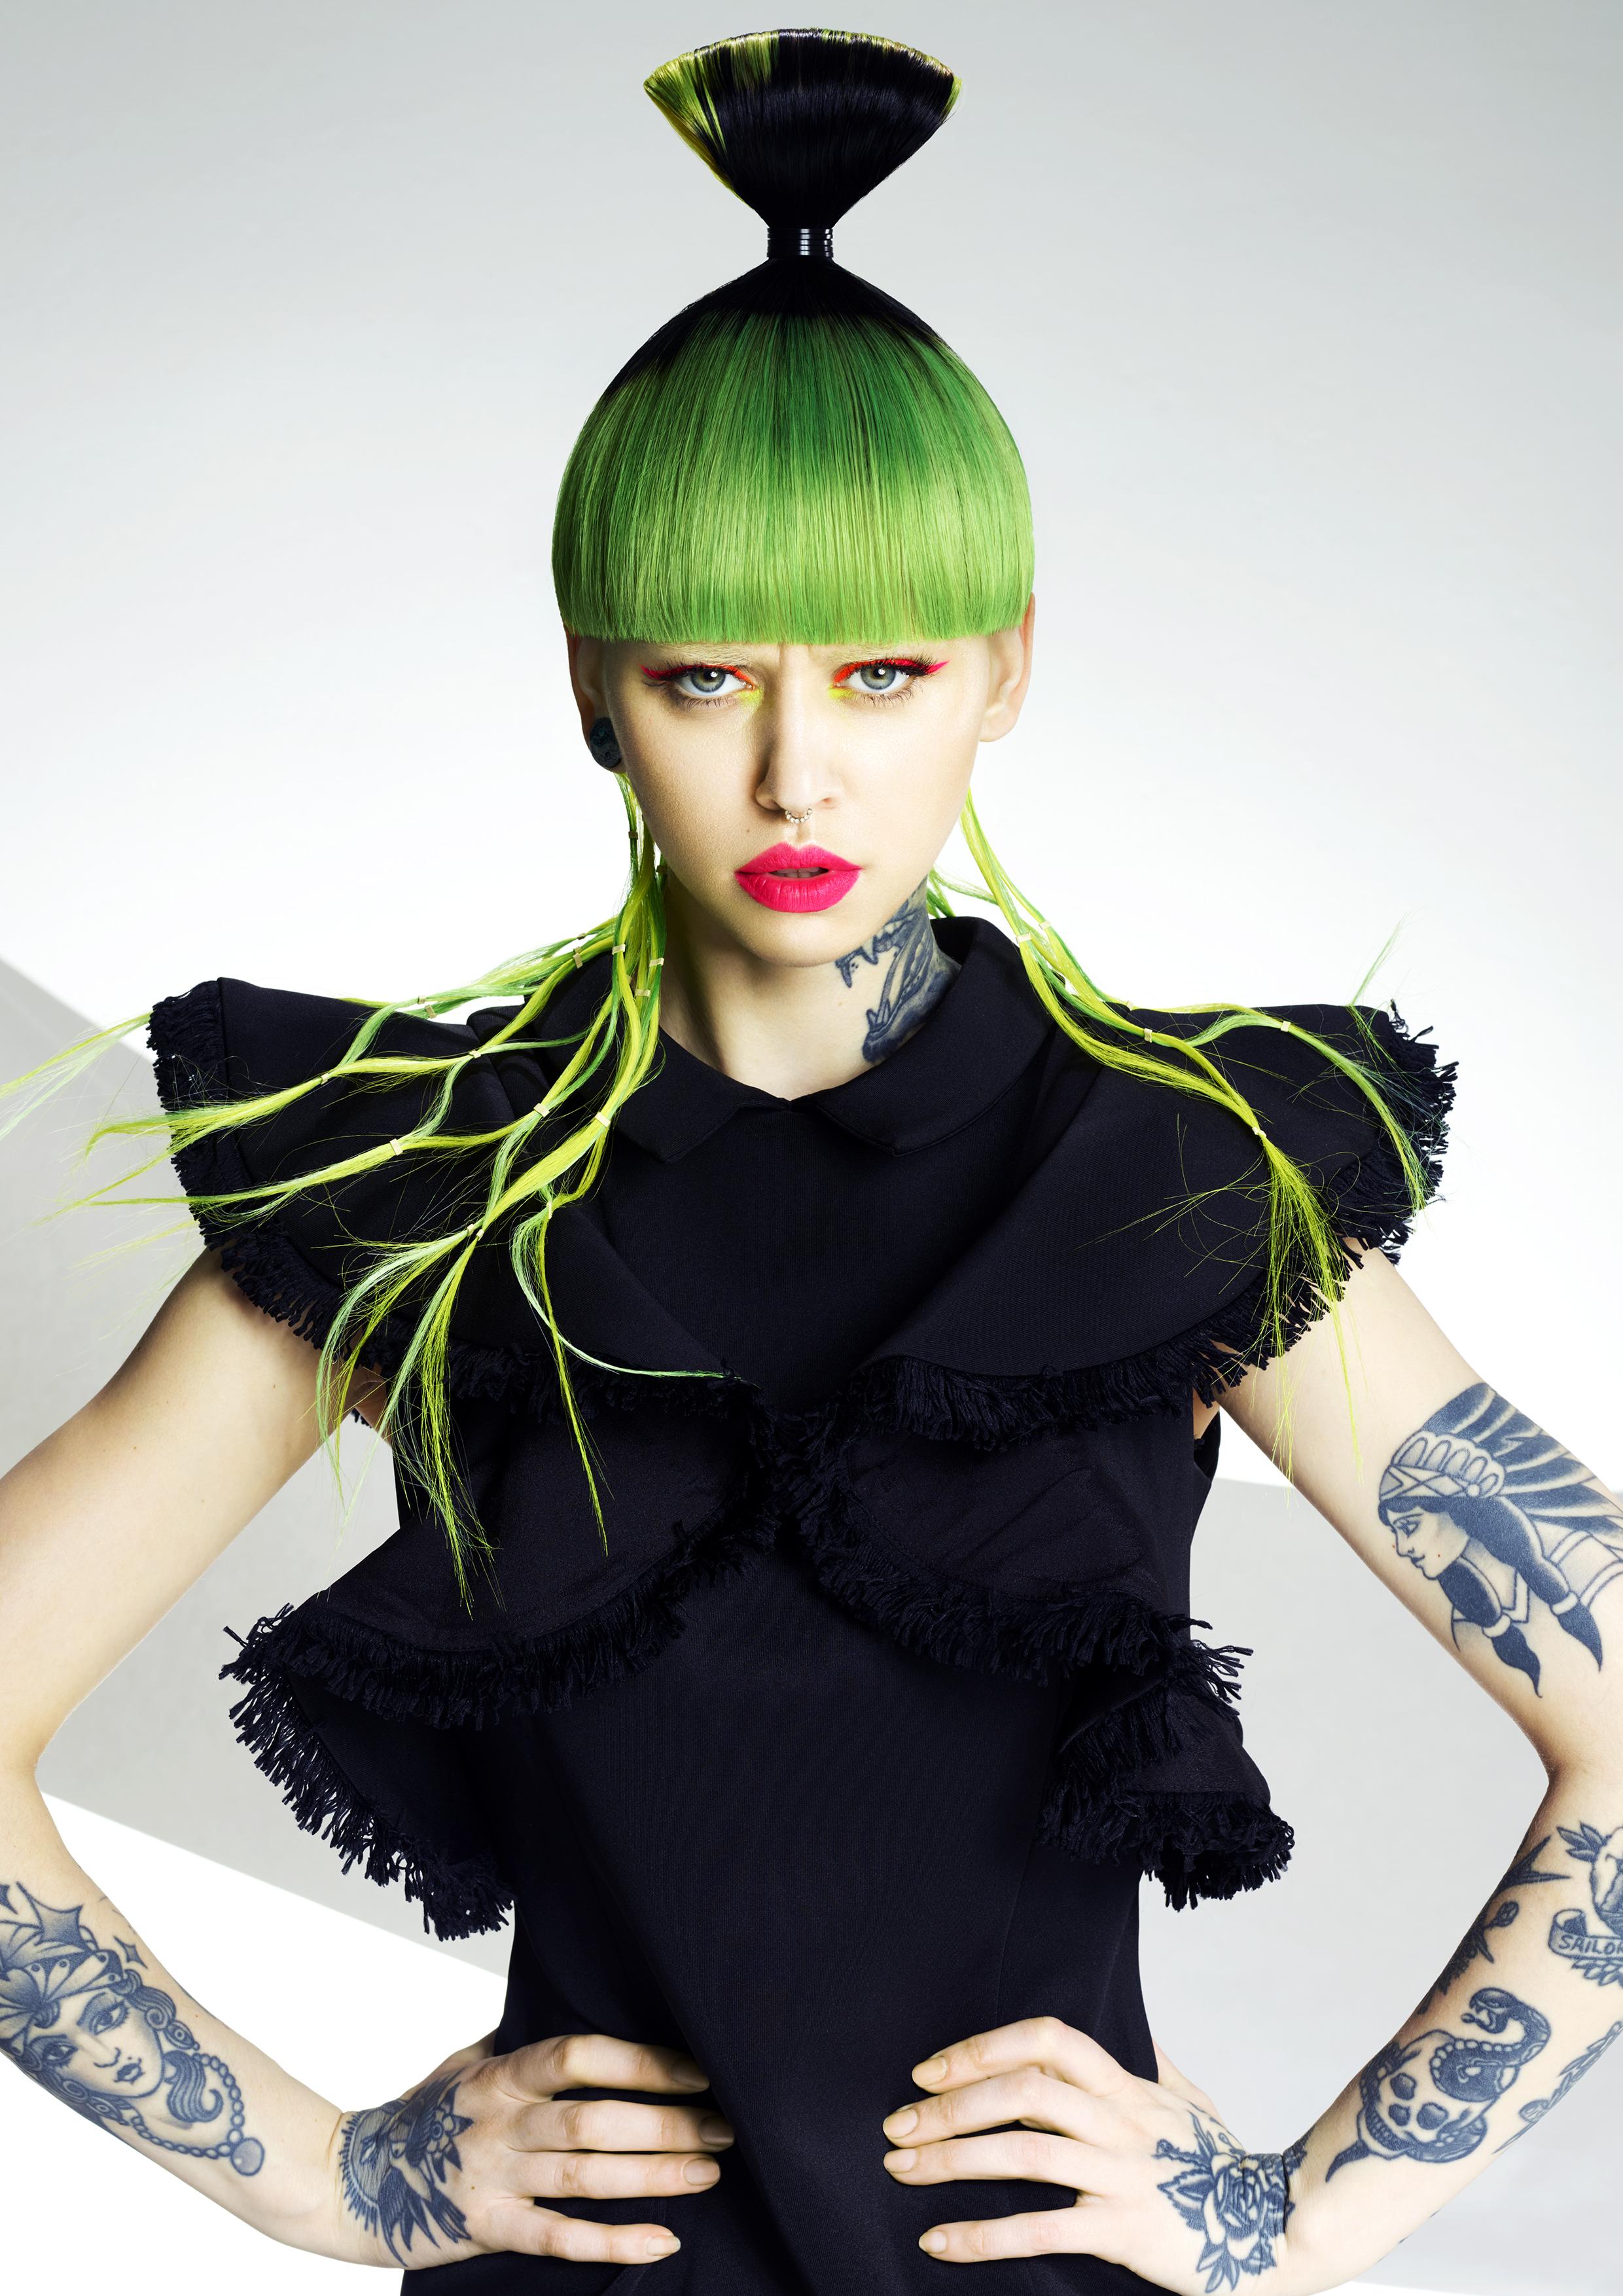 Coiffure, couleur, stylisme : Maggie Semaan, photo : John Rawson, maquillage : Maddie Austin, Produits : Balmain Hair Couture, Images : FPA